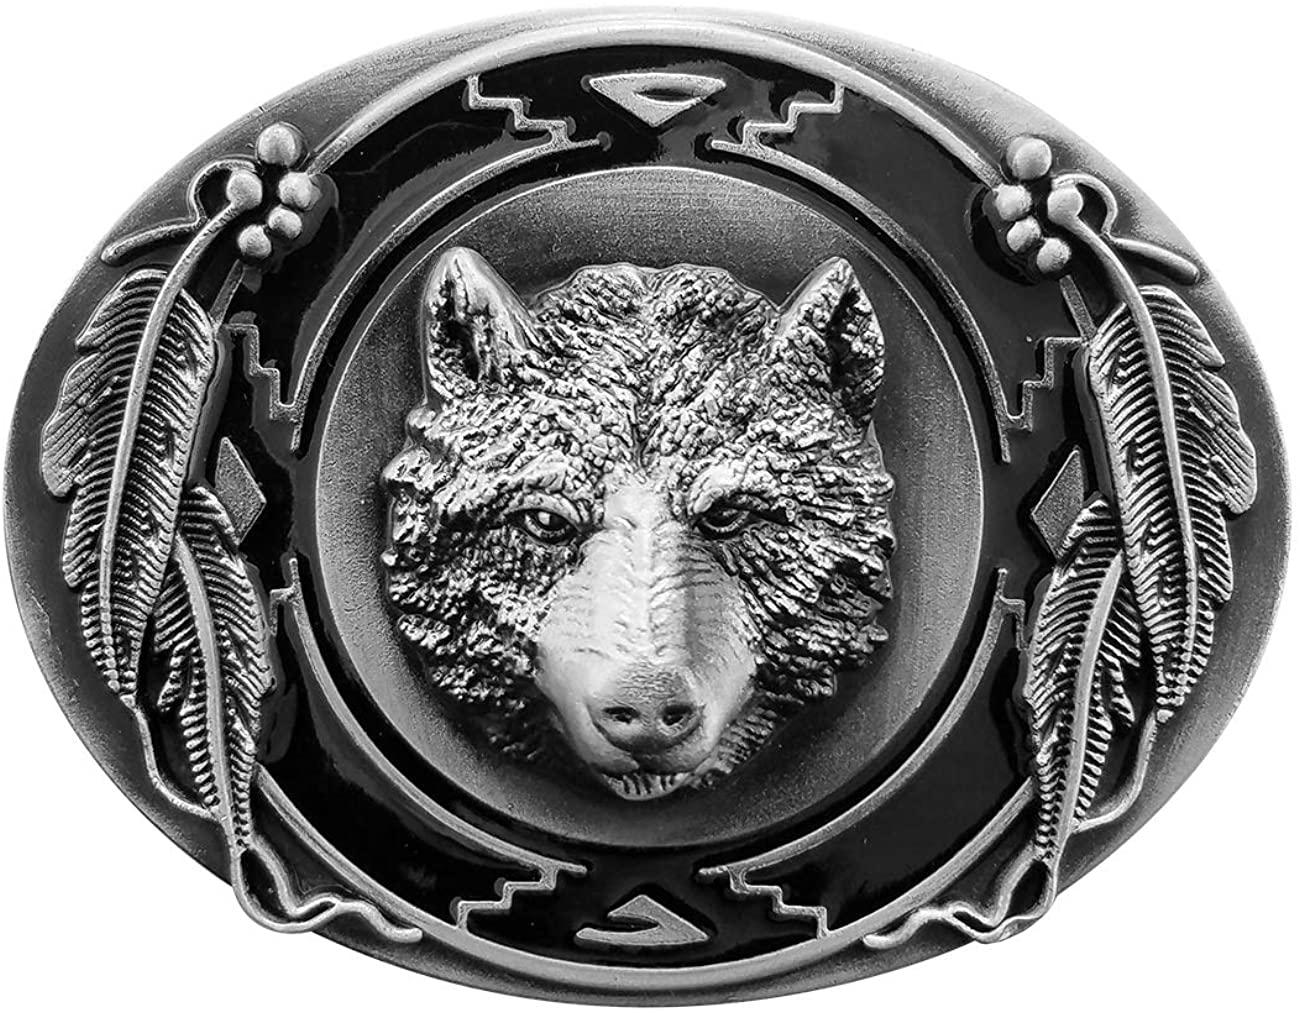 QUKE Vintage Howling Wild Wolf Belt Buckle Western Cowboy 3D Hunting Wolf Head Belt Buckle